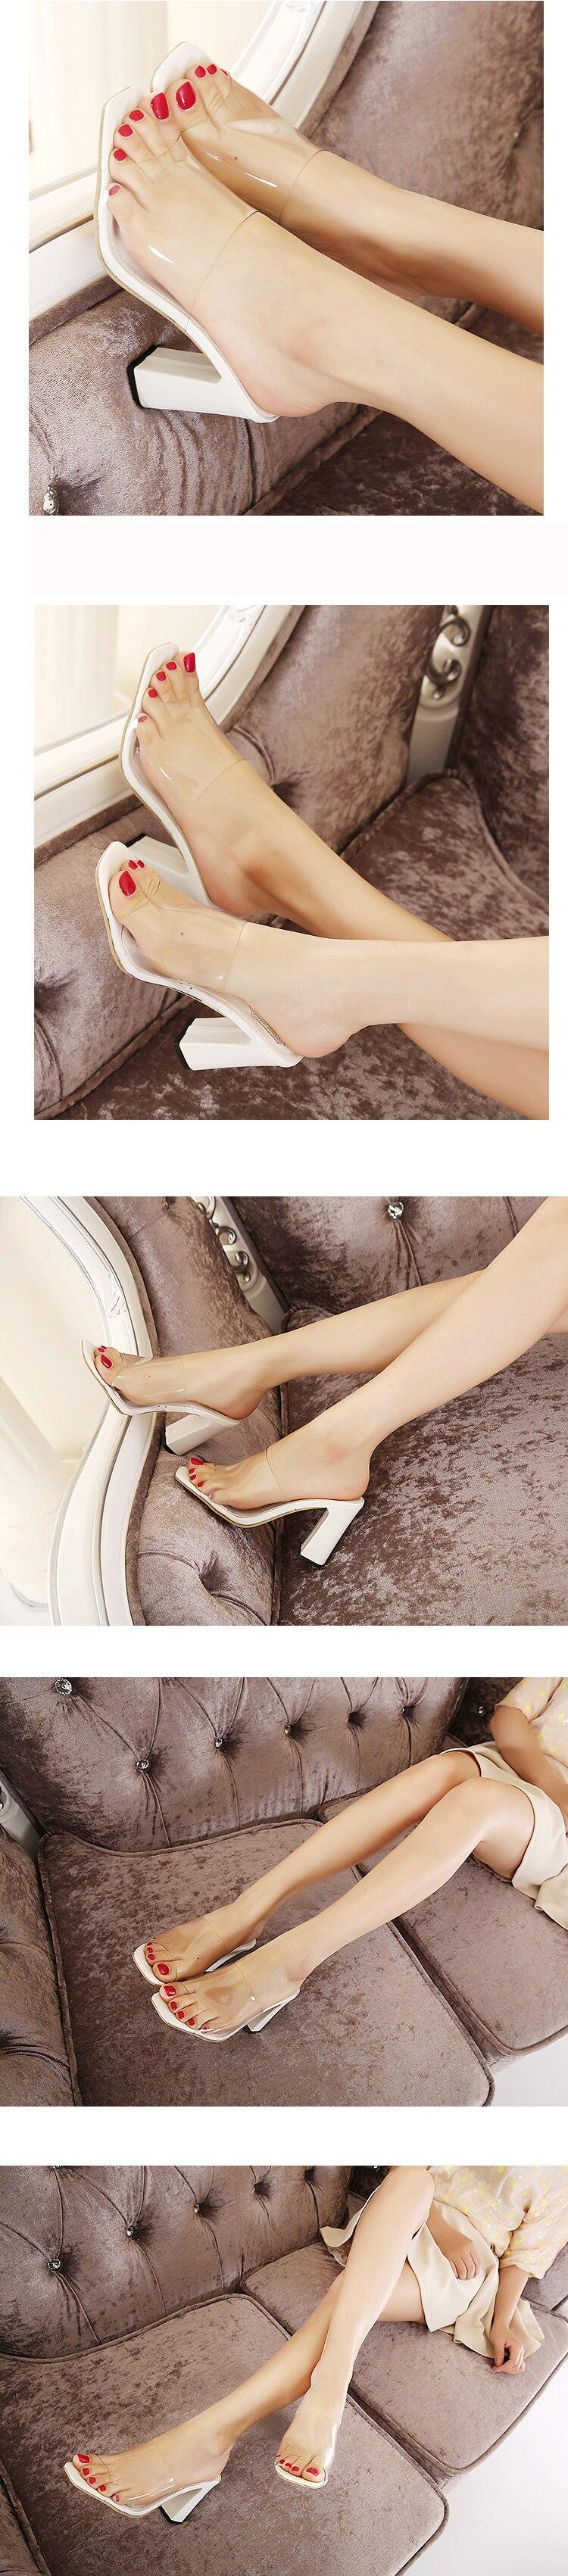 HTB1mFHDhsnI8KJjSsziq6z8QpXaa Eilyken 2019 Summer Rome Sandals Women Leisure slippers Fashion Women's Sandals Slides shoes Square heel 9.5cm